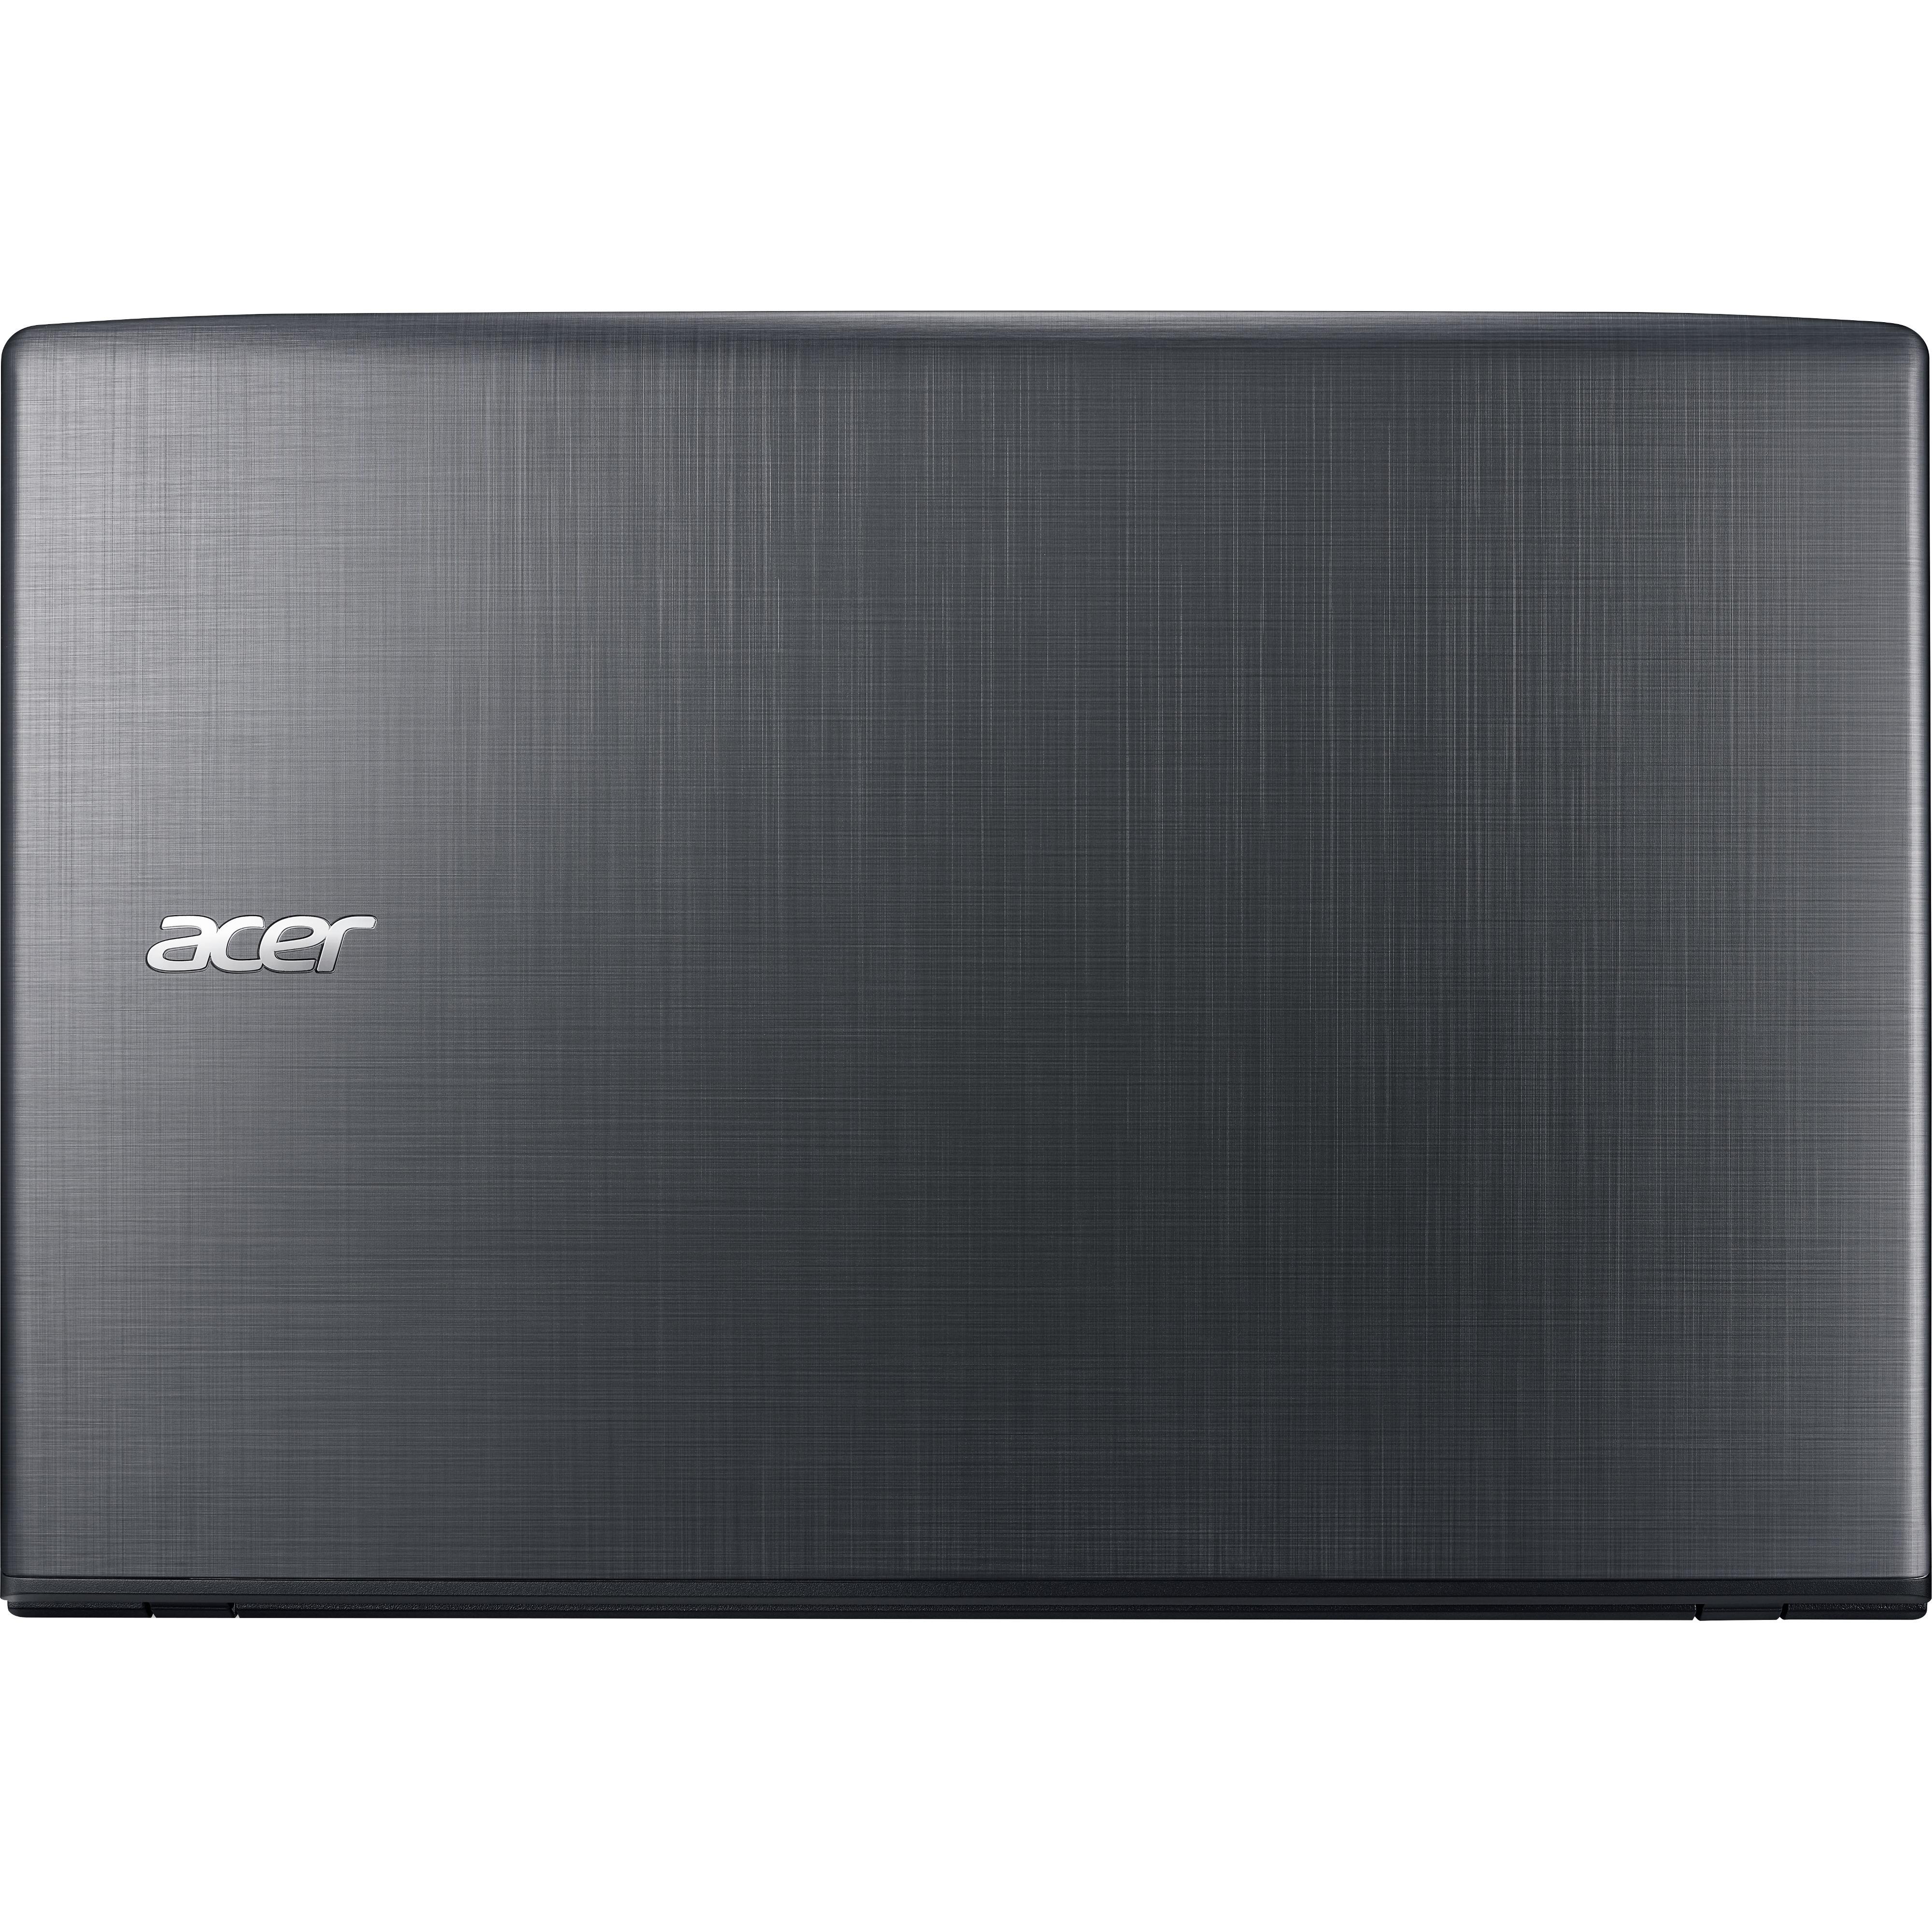 Acer TravelMate P259-G2-M TMP259-G2-M-59Q6 39.6 cm 15.6inch Active Matrix TFT Colour LCD Notebook - Intel Core i5 7th Gen i5-7200U 2.50 GHz - 4 GB DDR4 SDRAM - 500